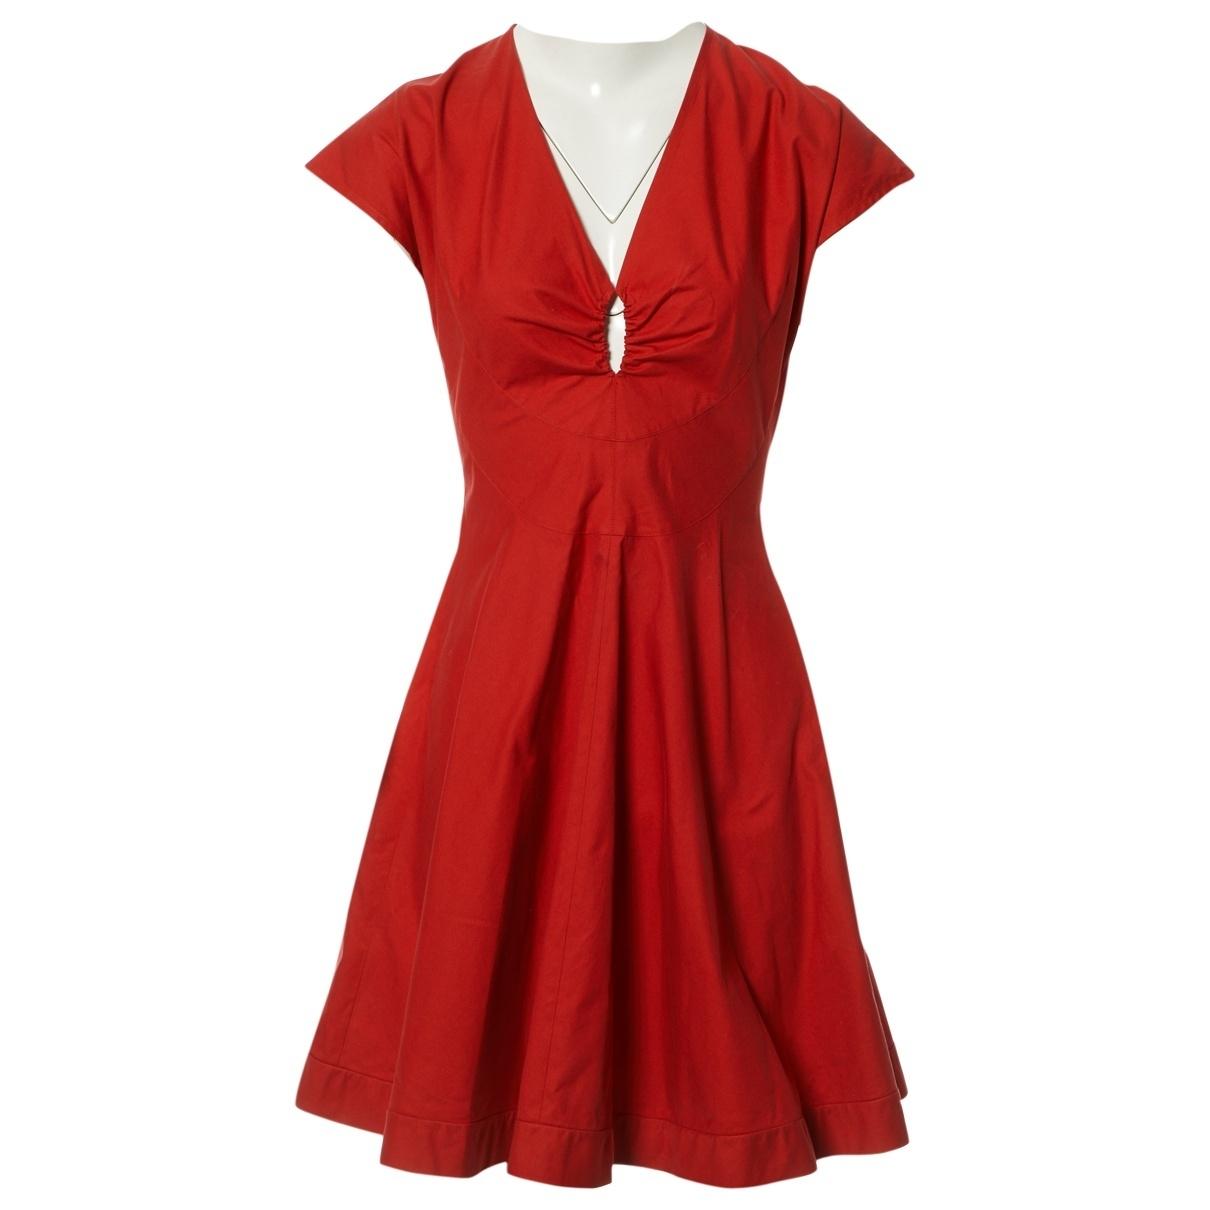 Alaïa N Red Cotton dress for Women 38 FR